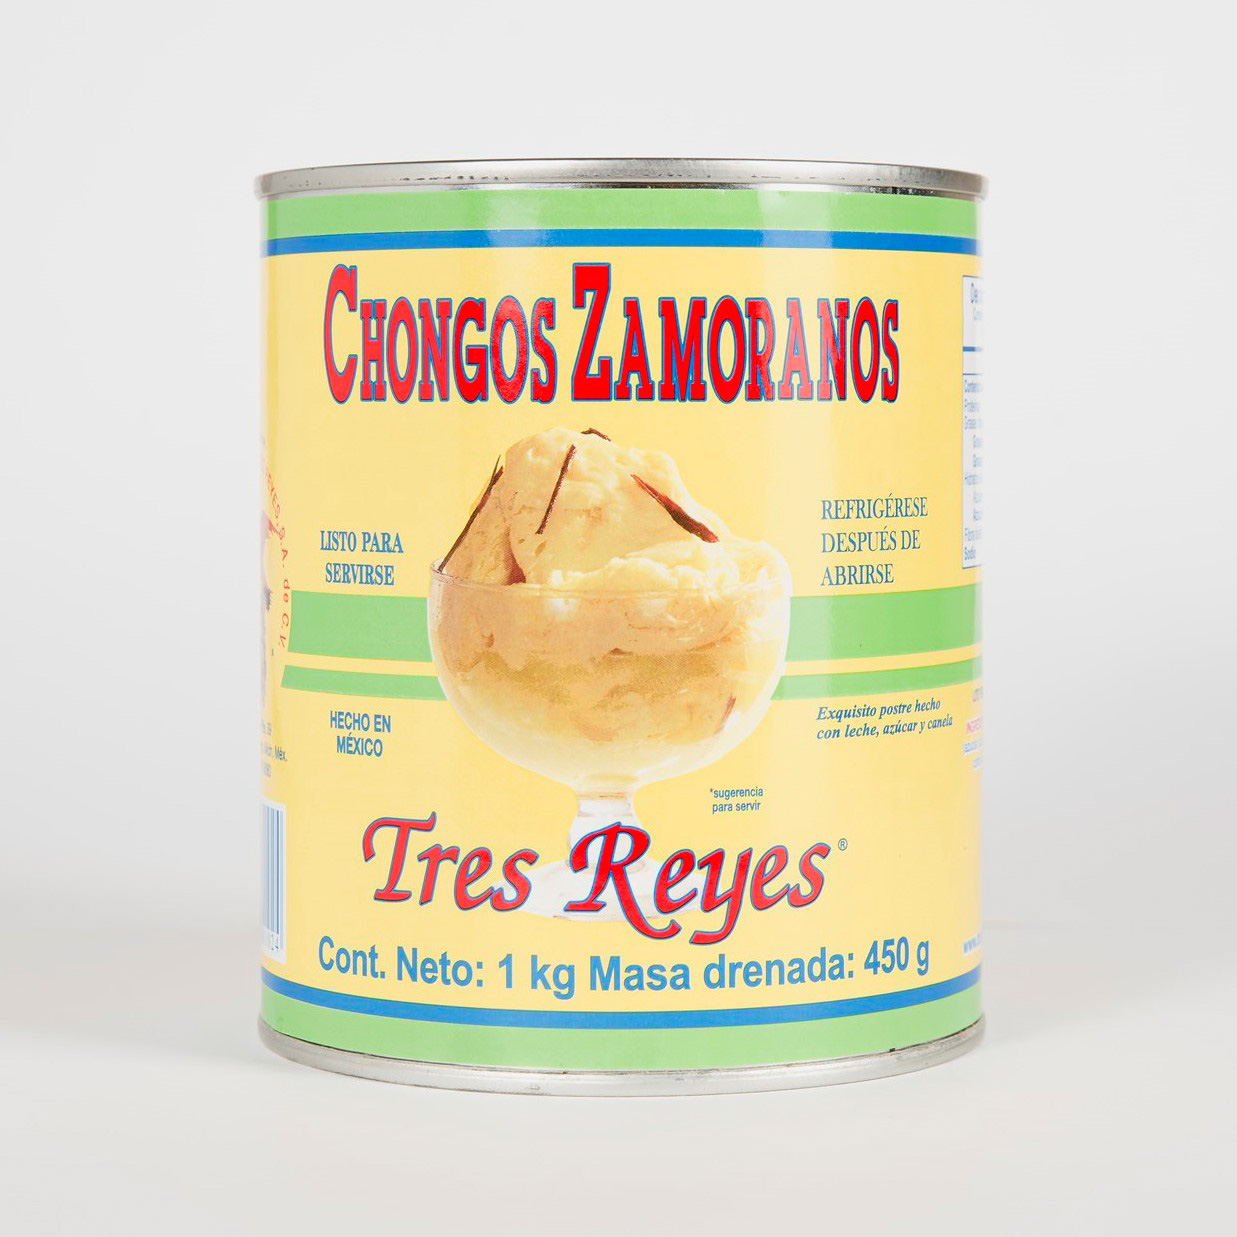 canned chongos zamoranos